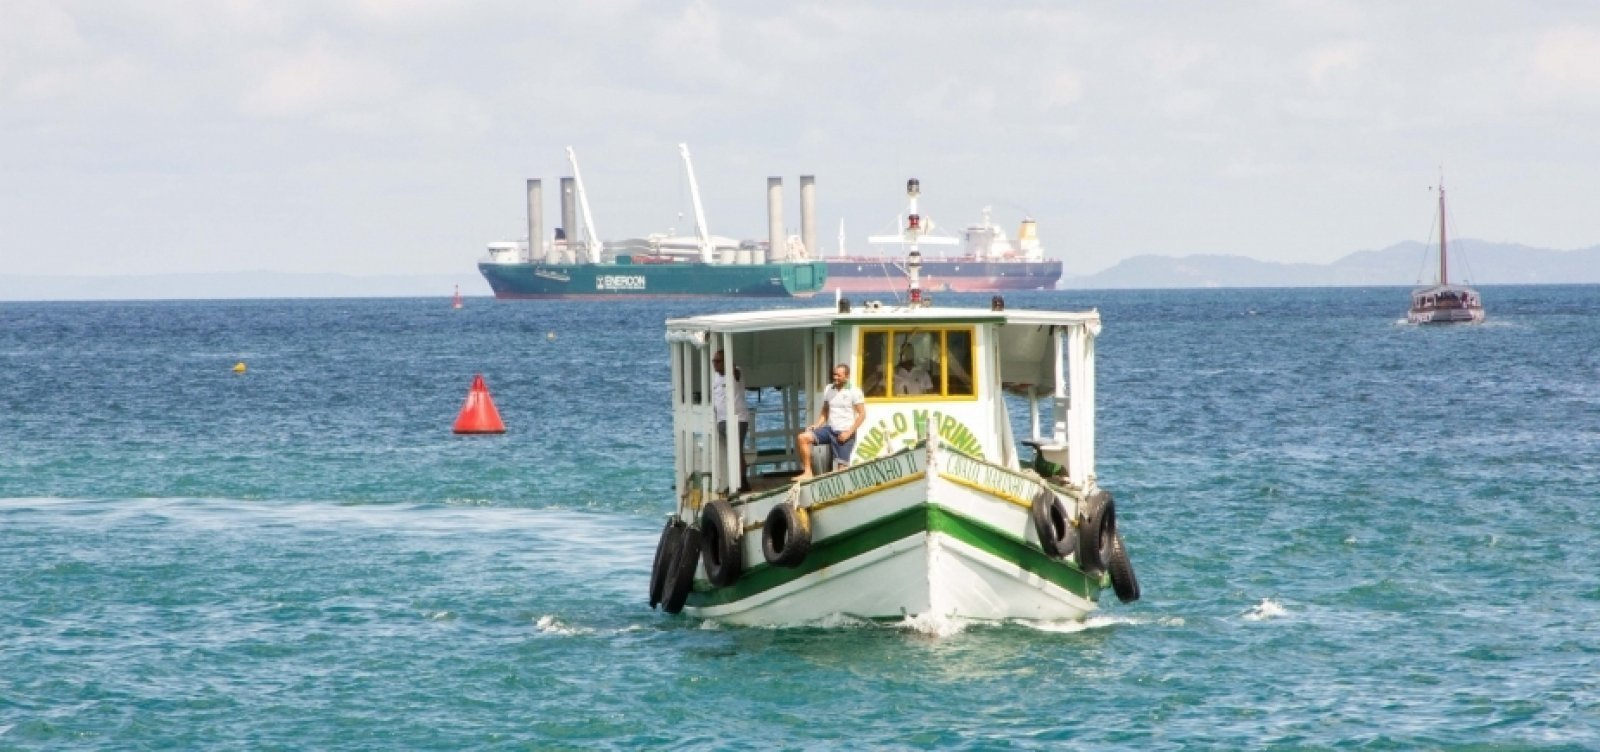 Travessia de lanchas entre Salvador e Mar Grande é suspensa por causa da chuva